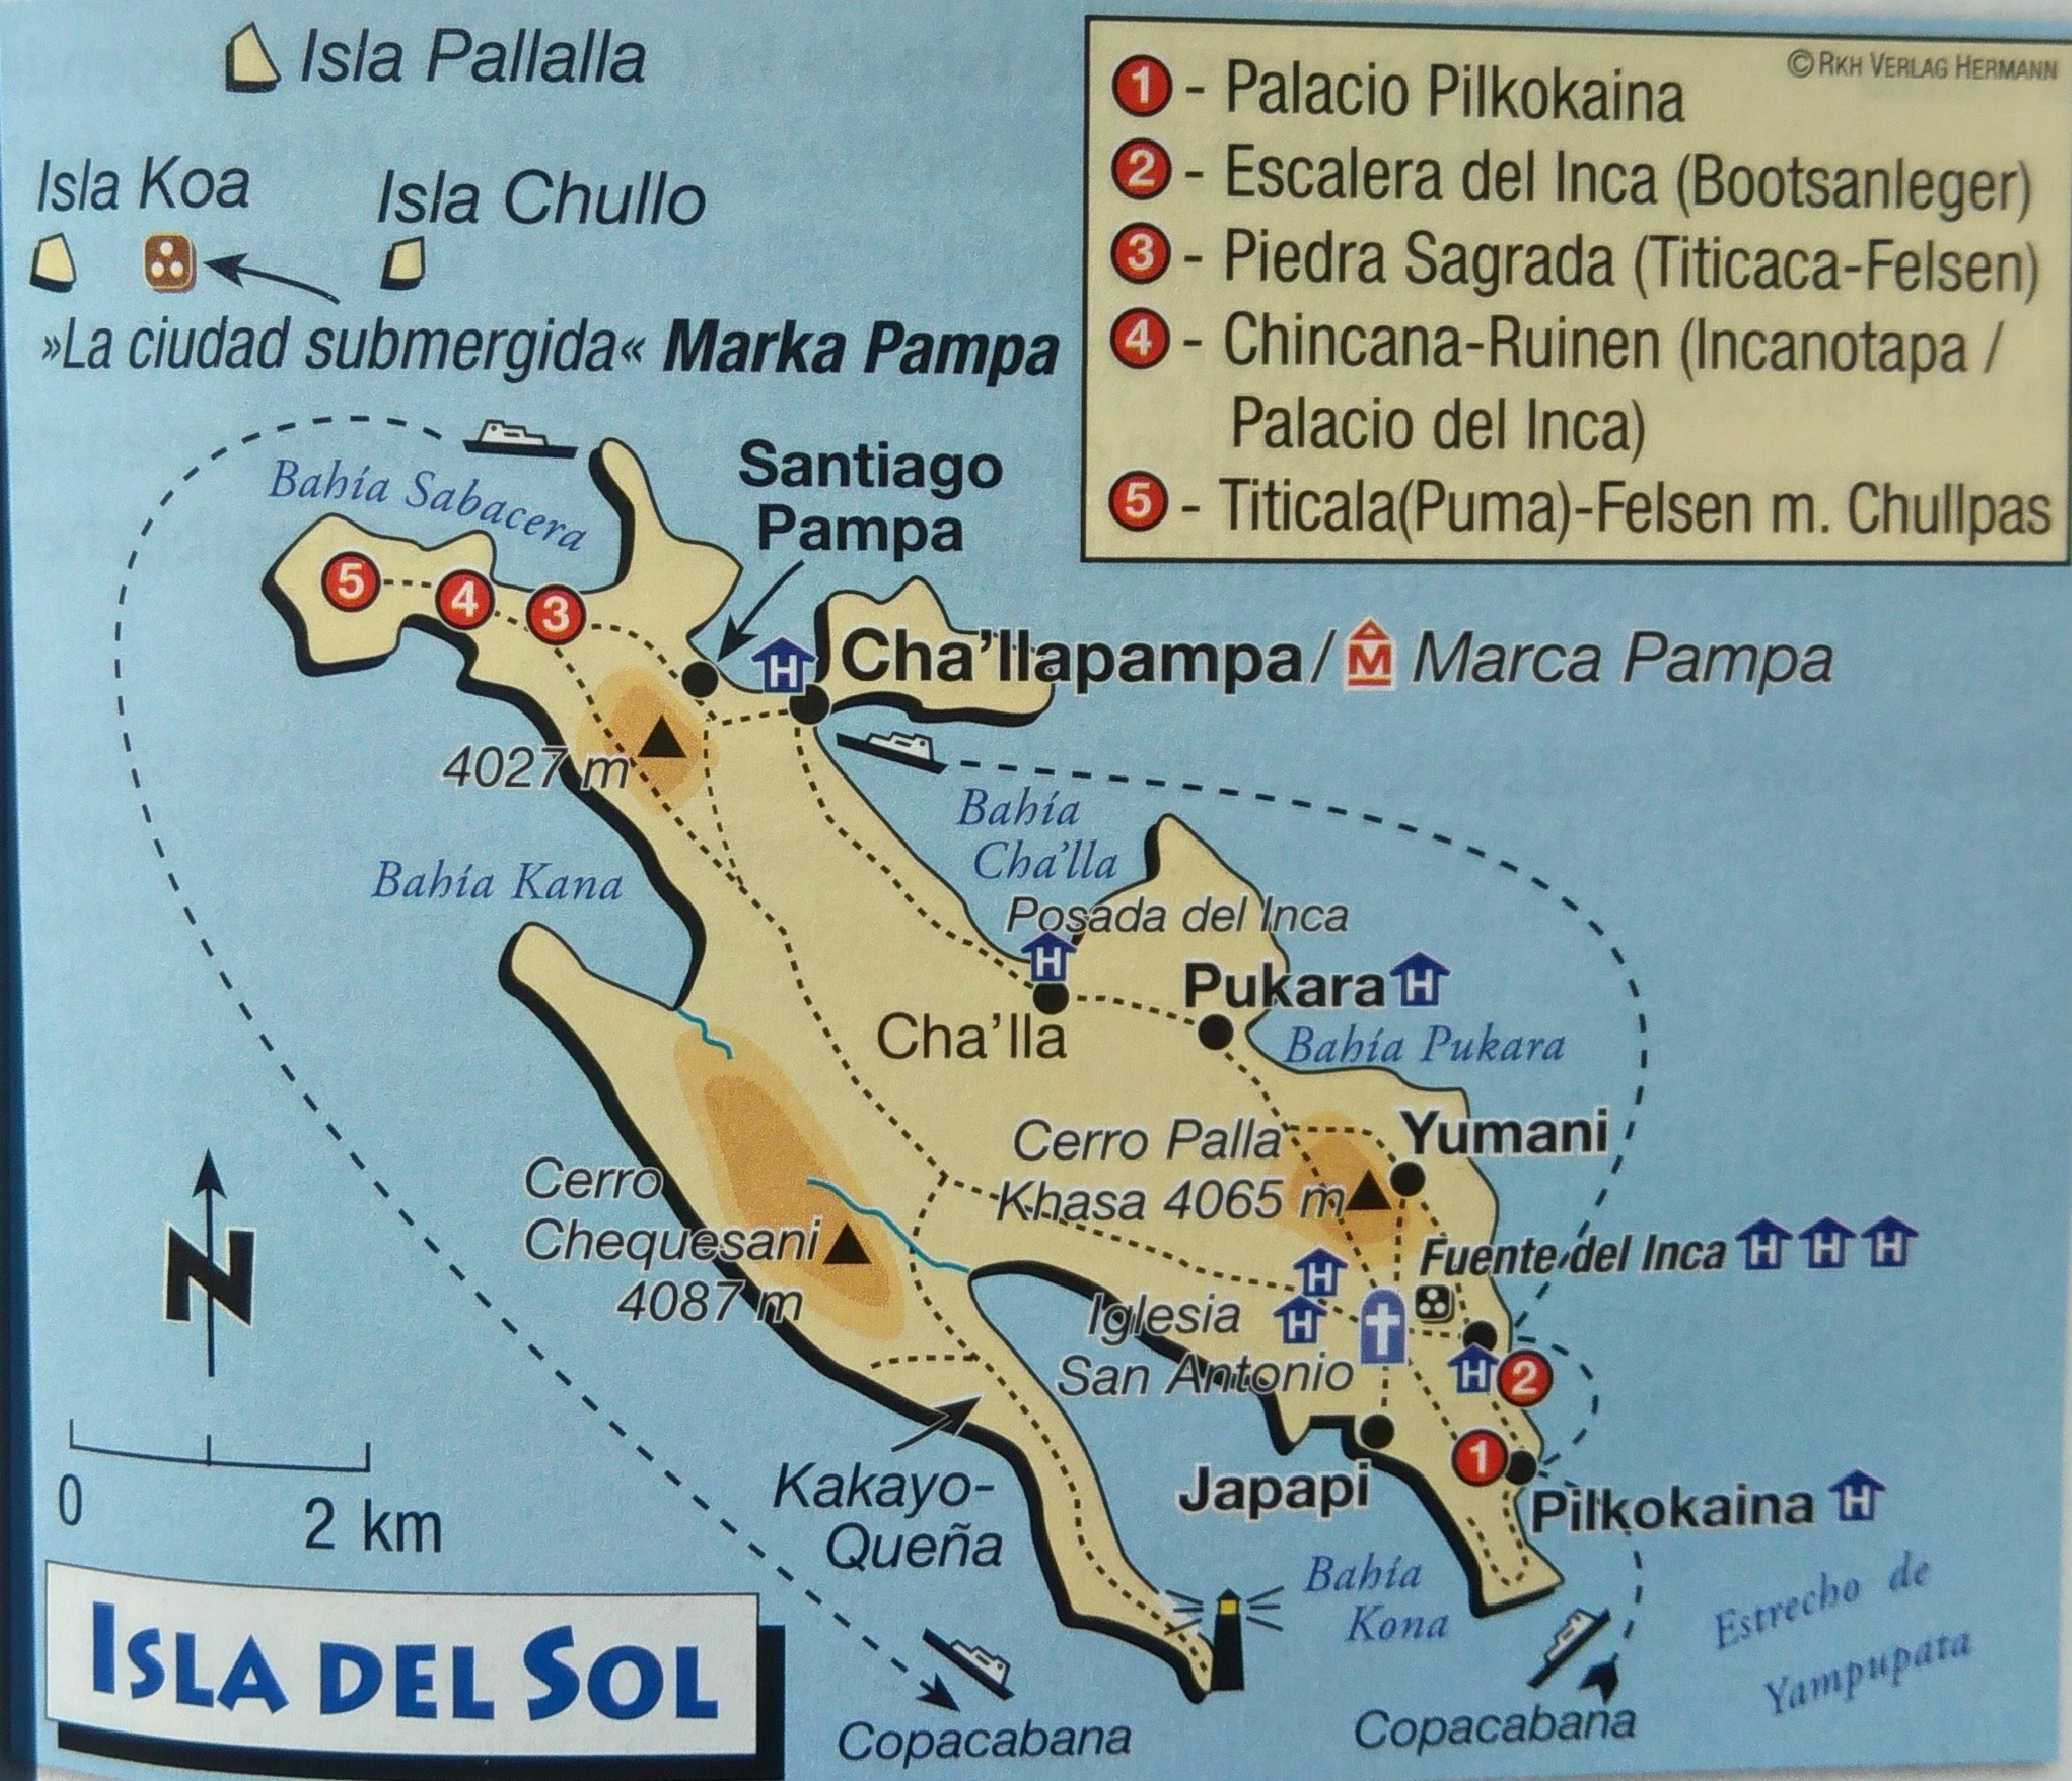 035 Isla del Soljpg